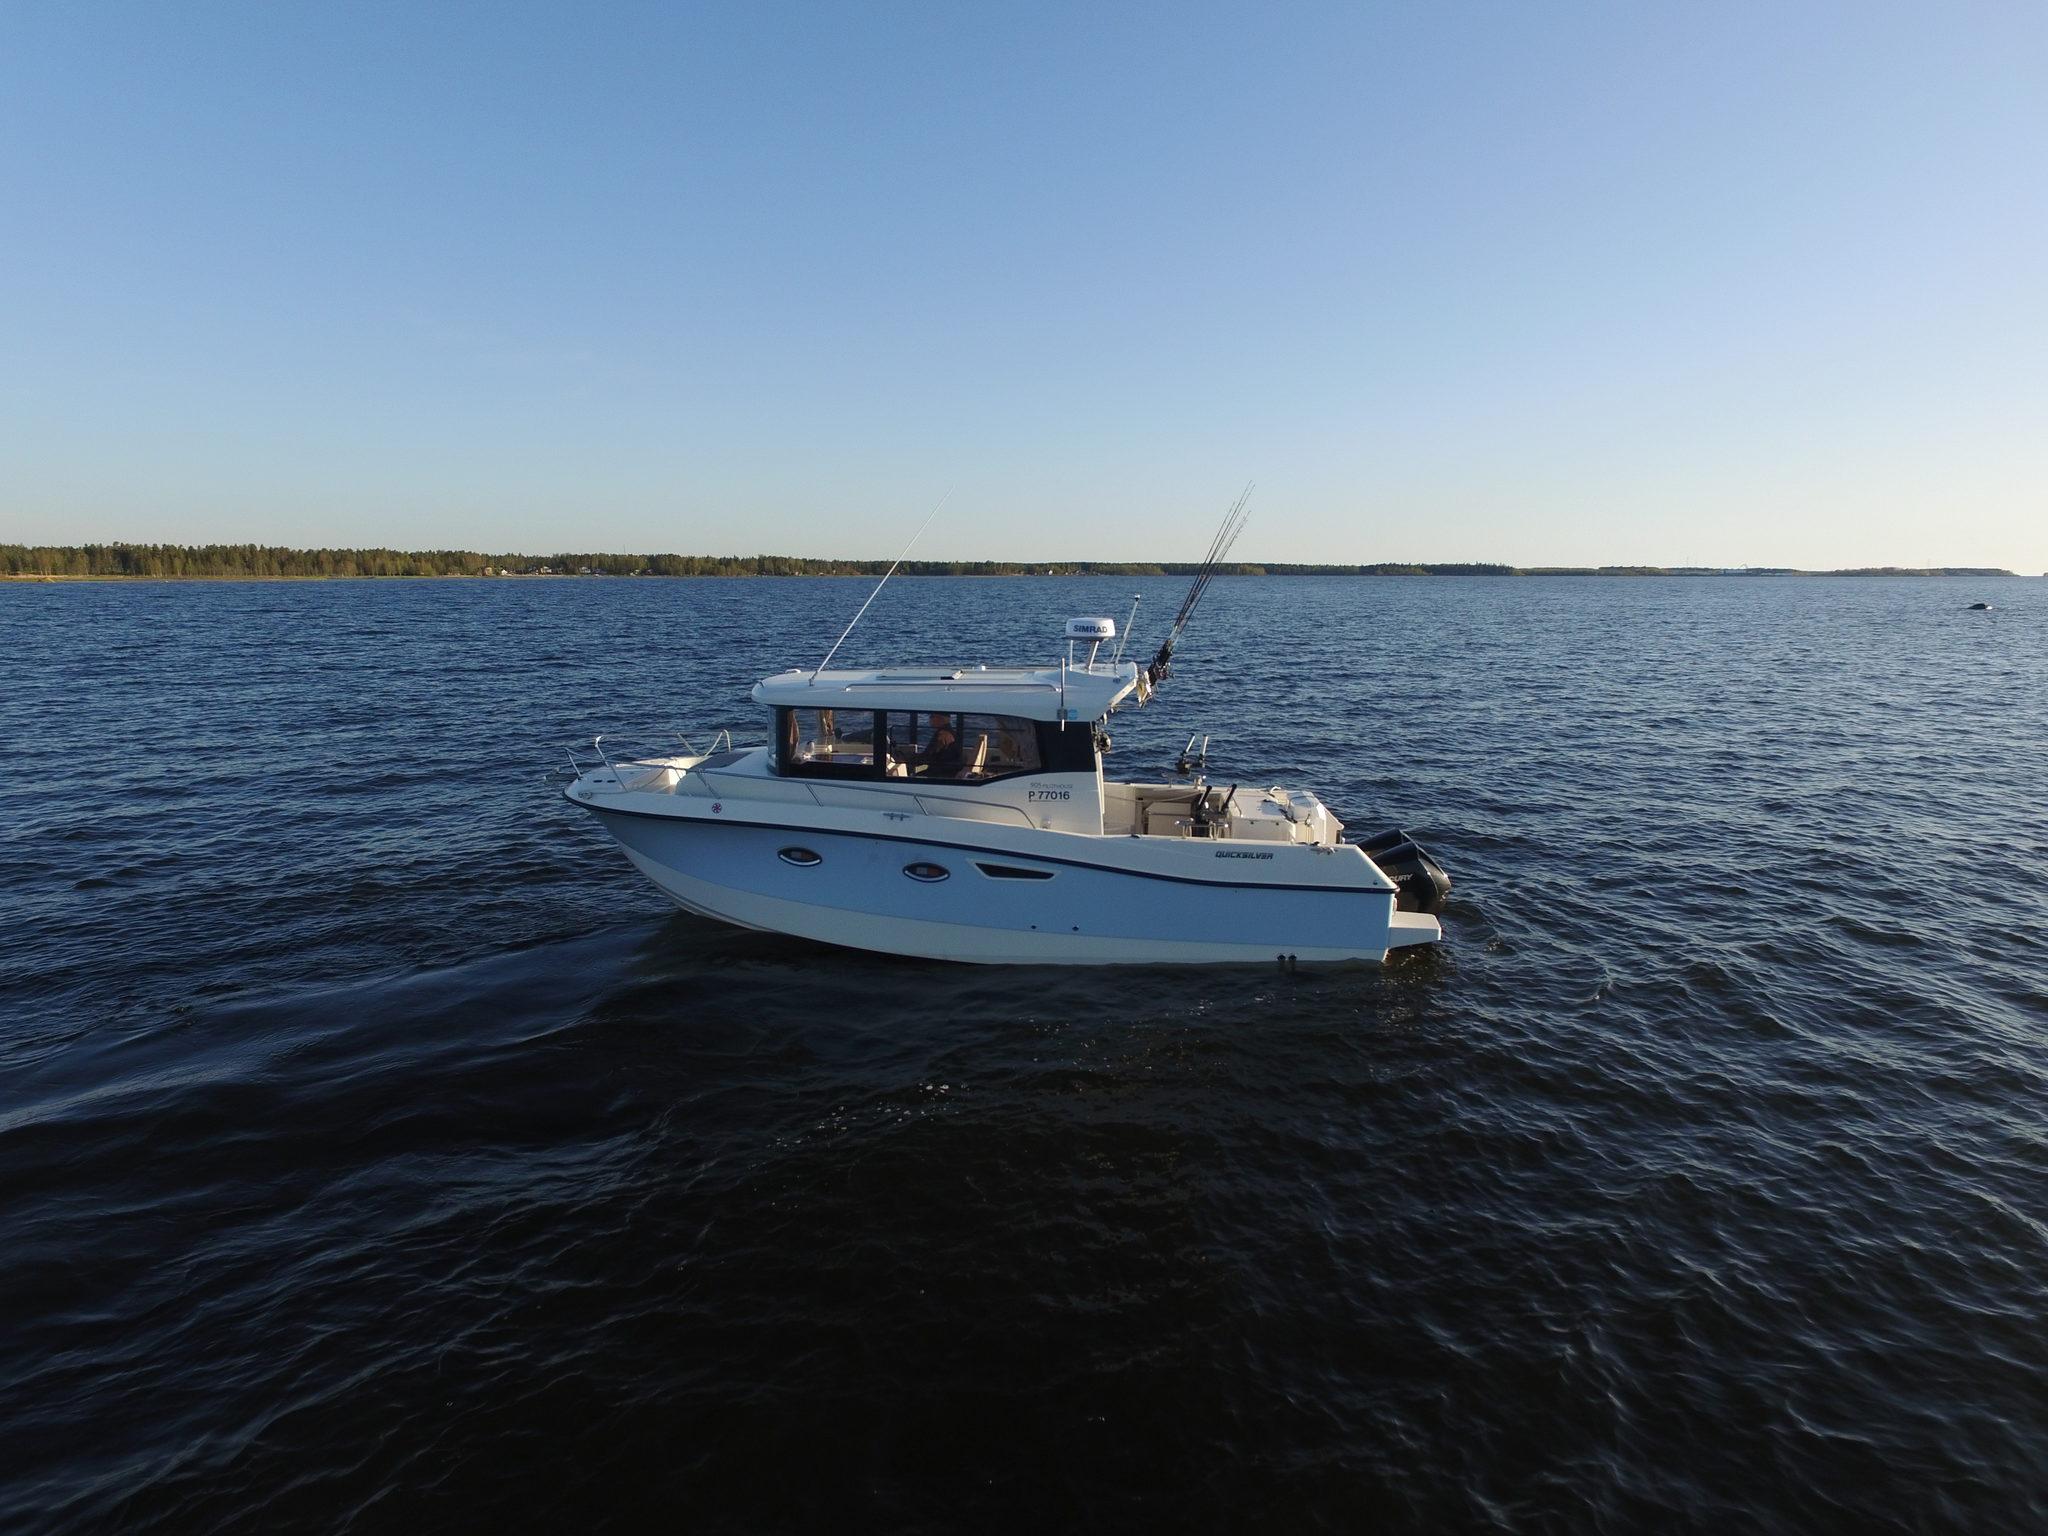 Meriretket Kalajoella